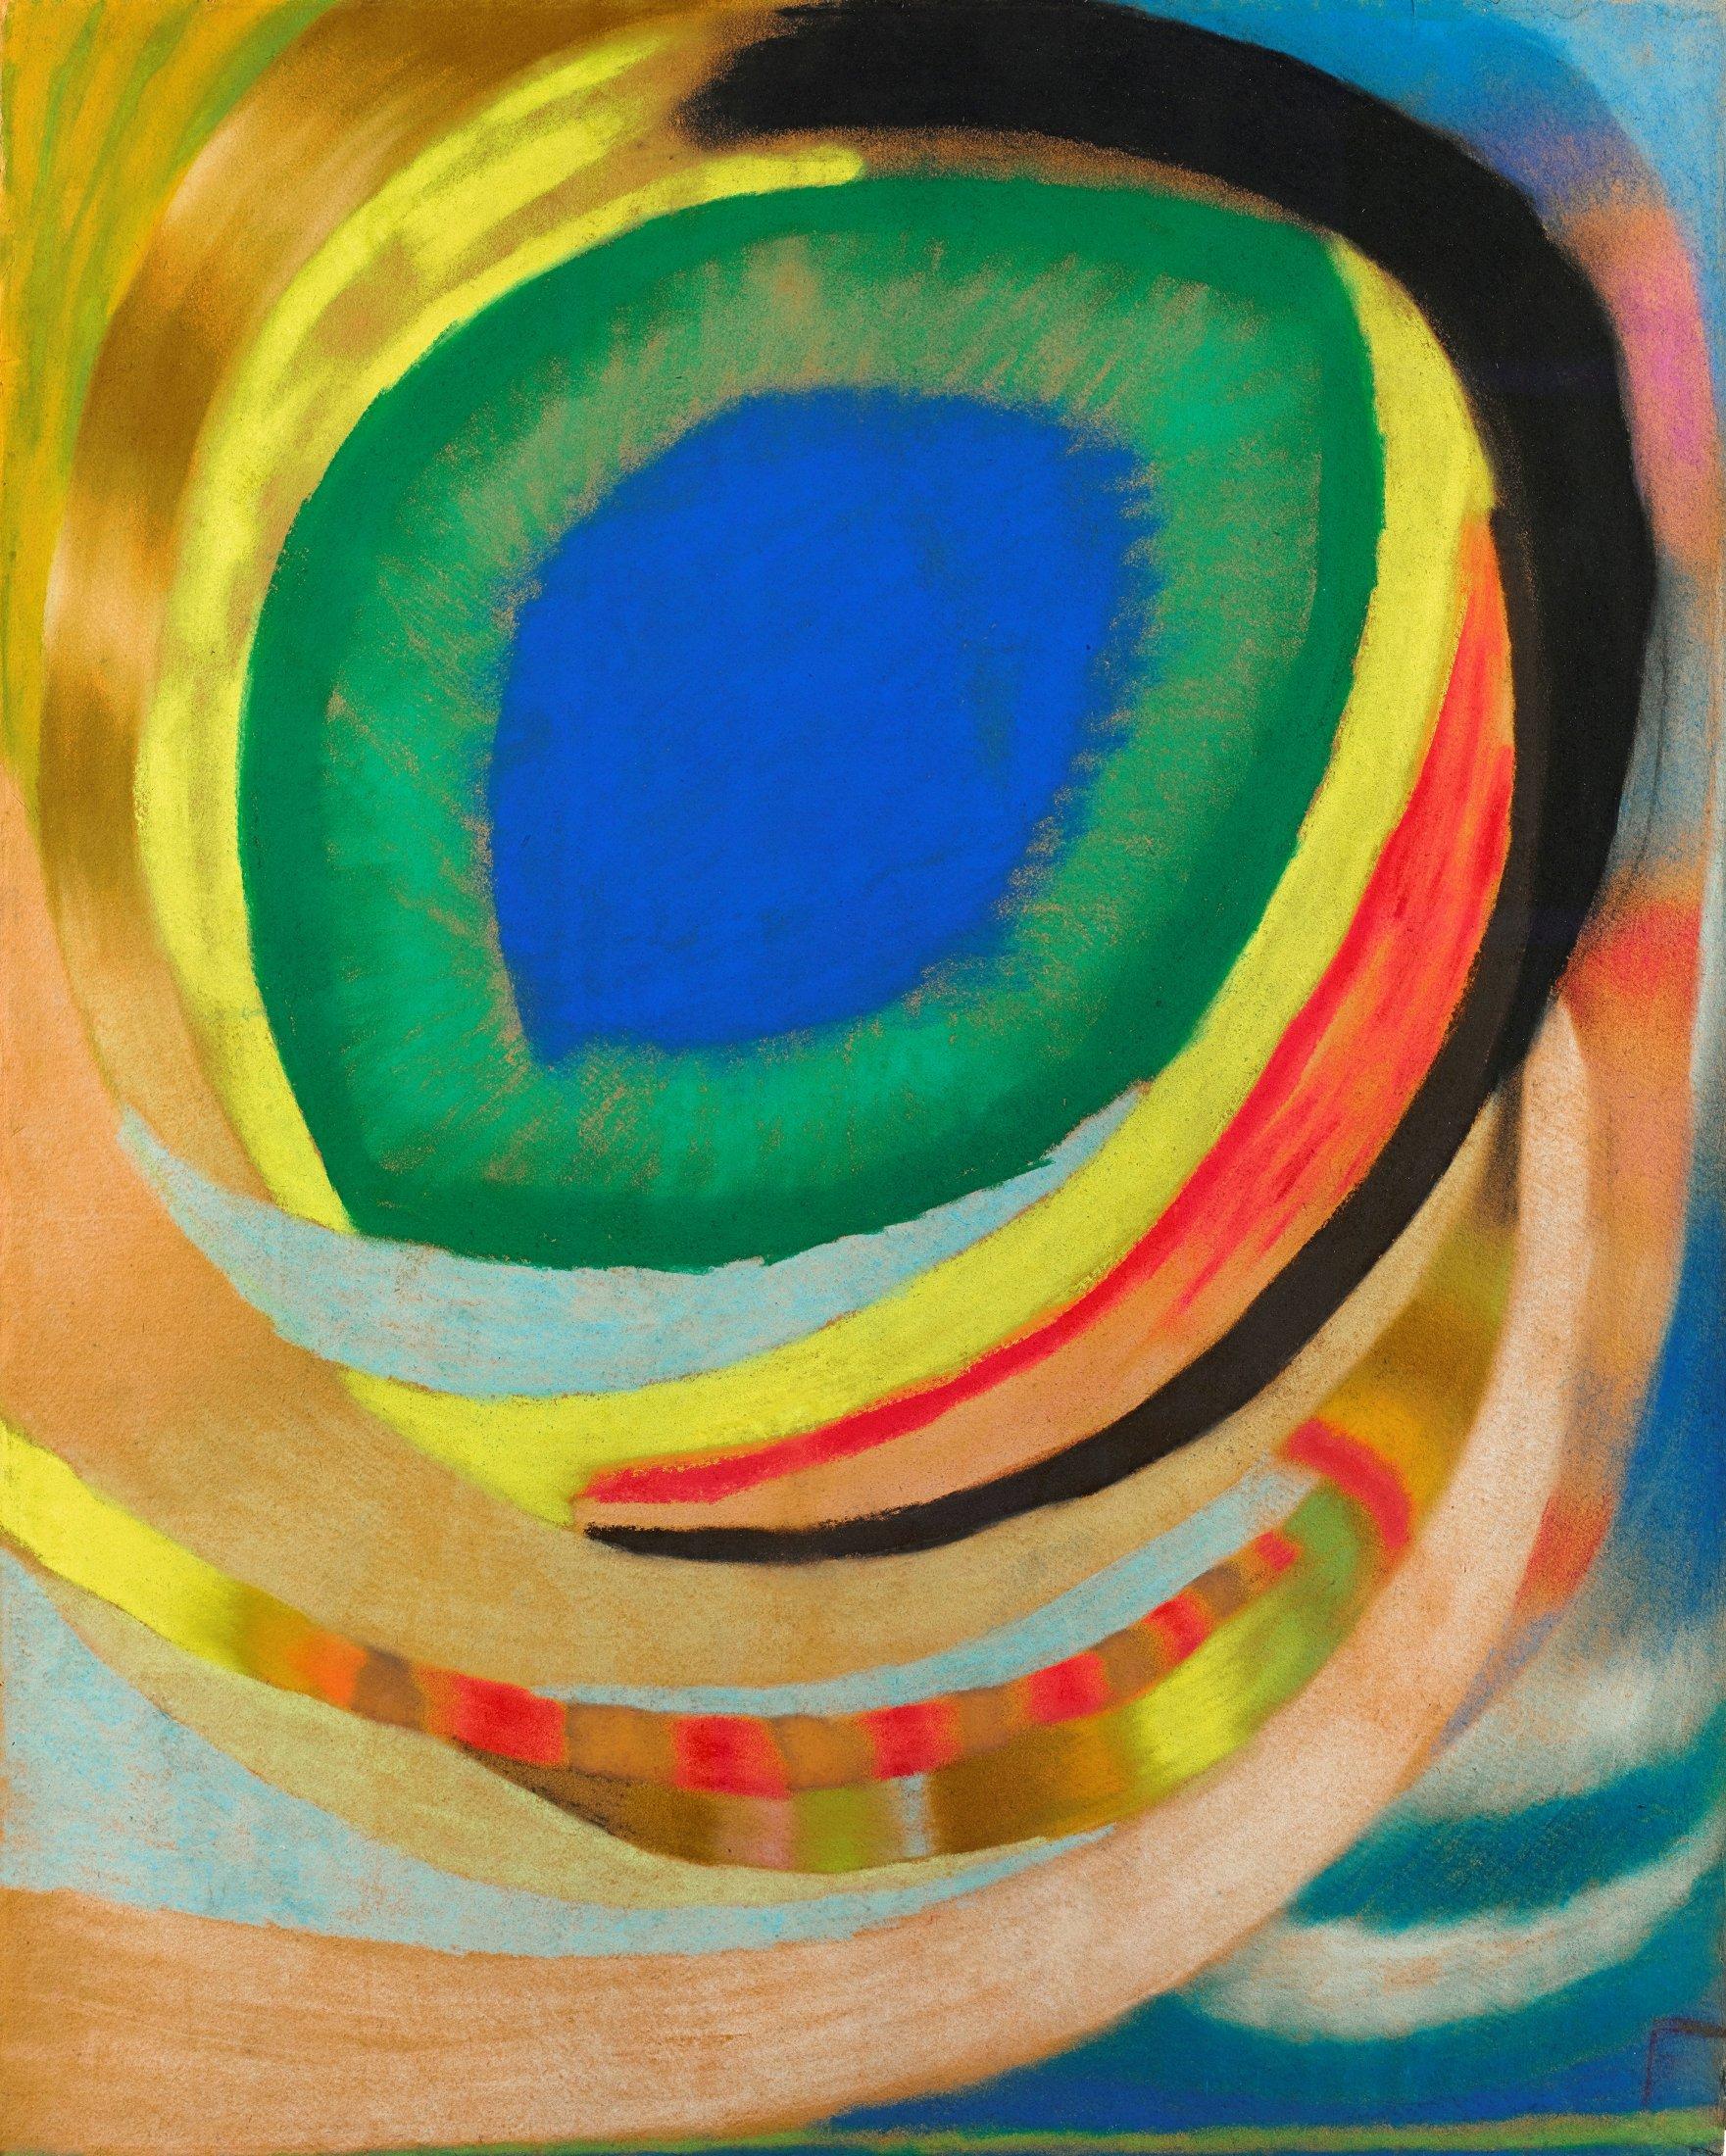 Kosmisches Auge, 1921/22